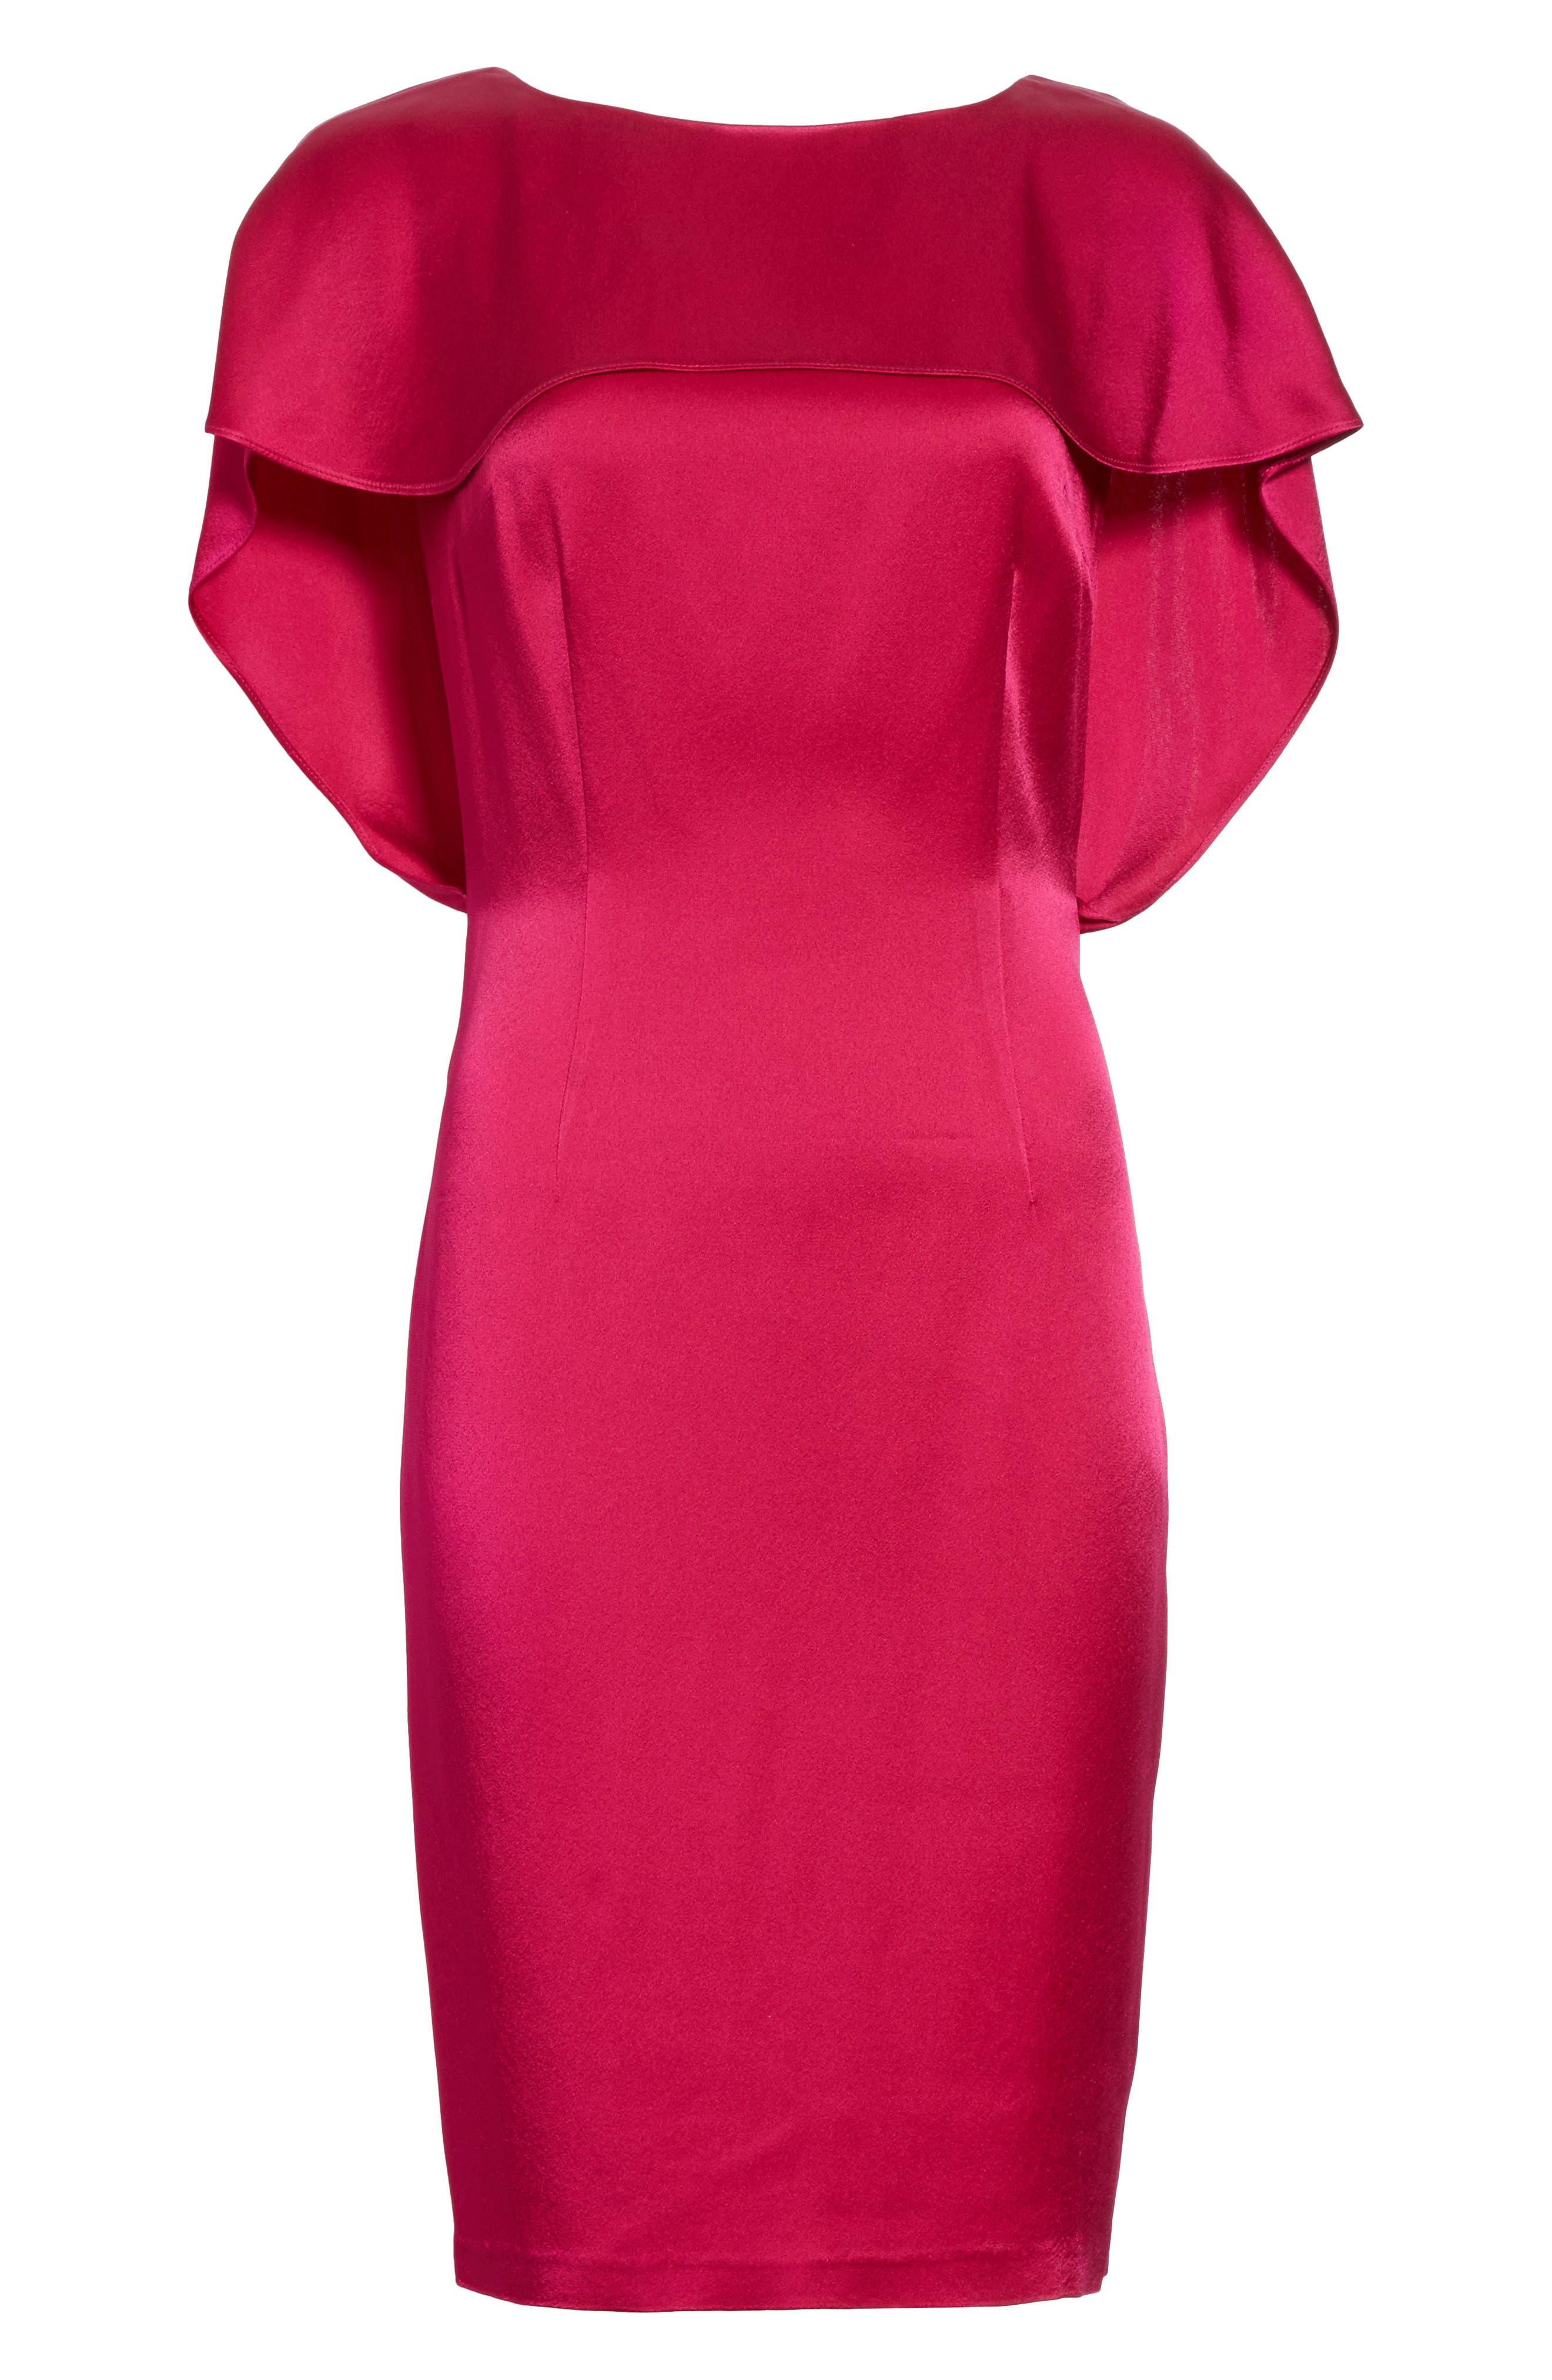 Draped Liquid Crepe Dress,                             Alternate thumbnail 6, color,                             600